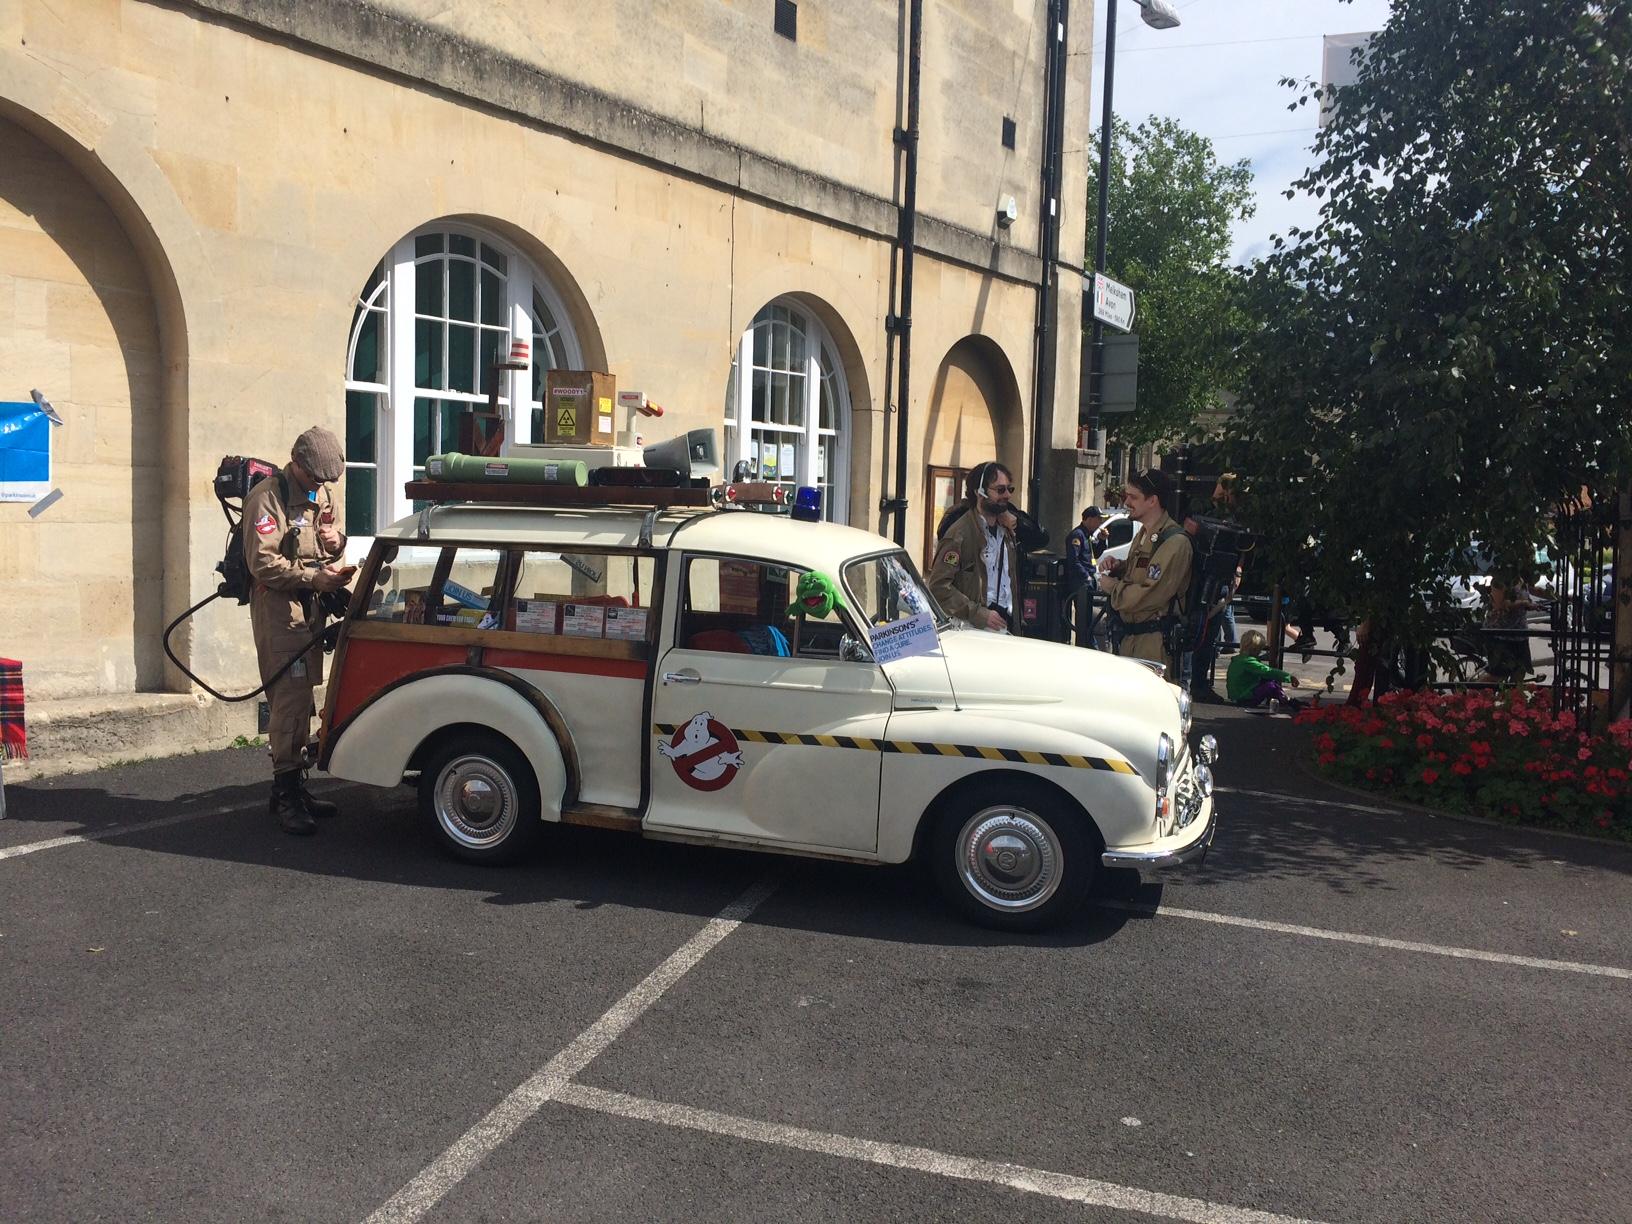 The British arm of Ghostbusters arrive at Melksham. Photo: Tony Esmond